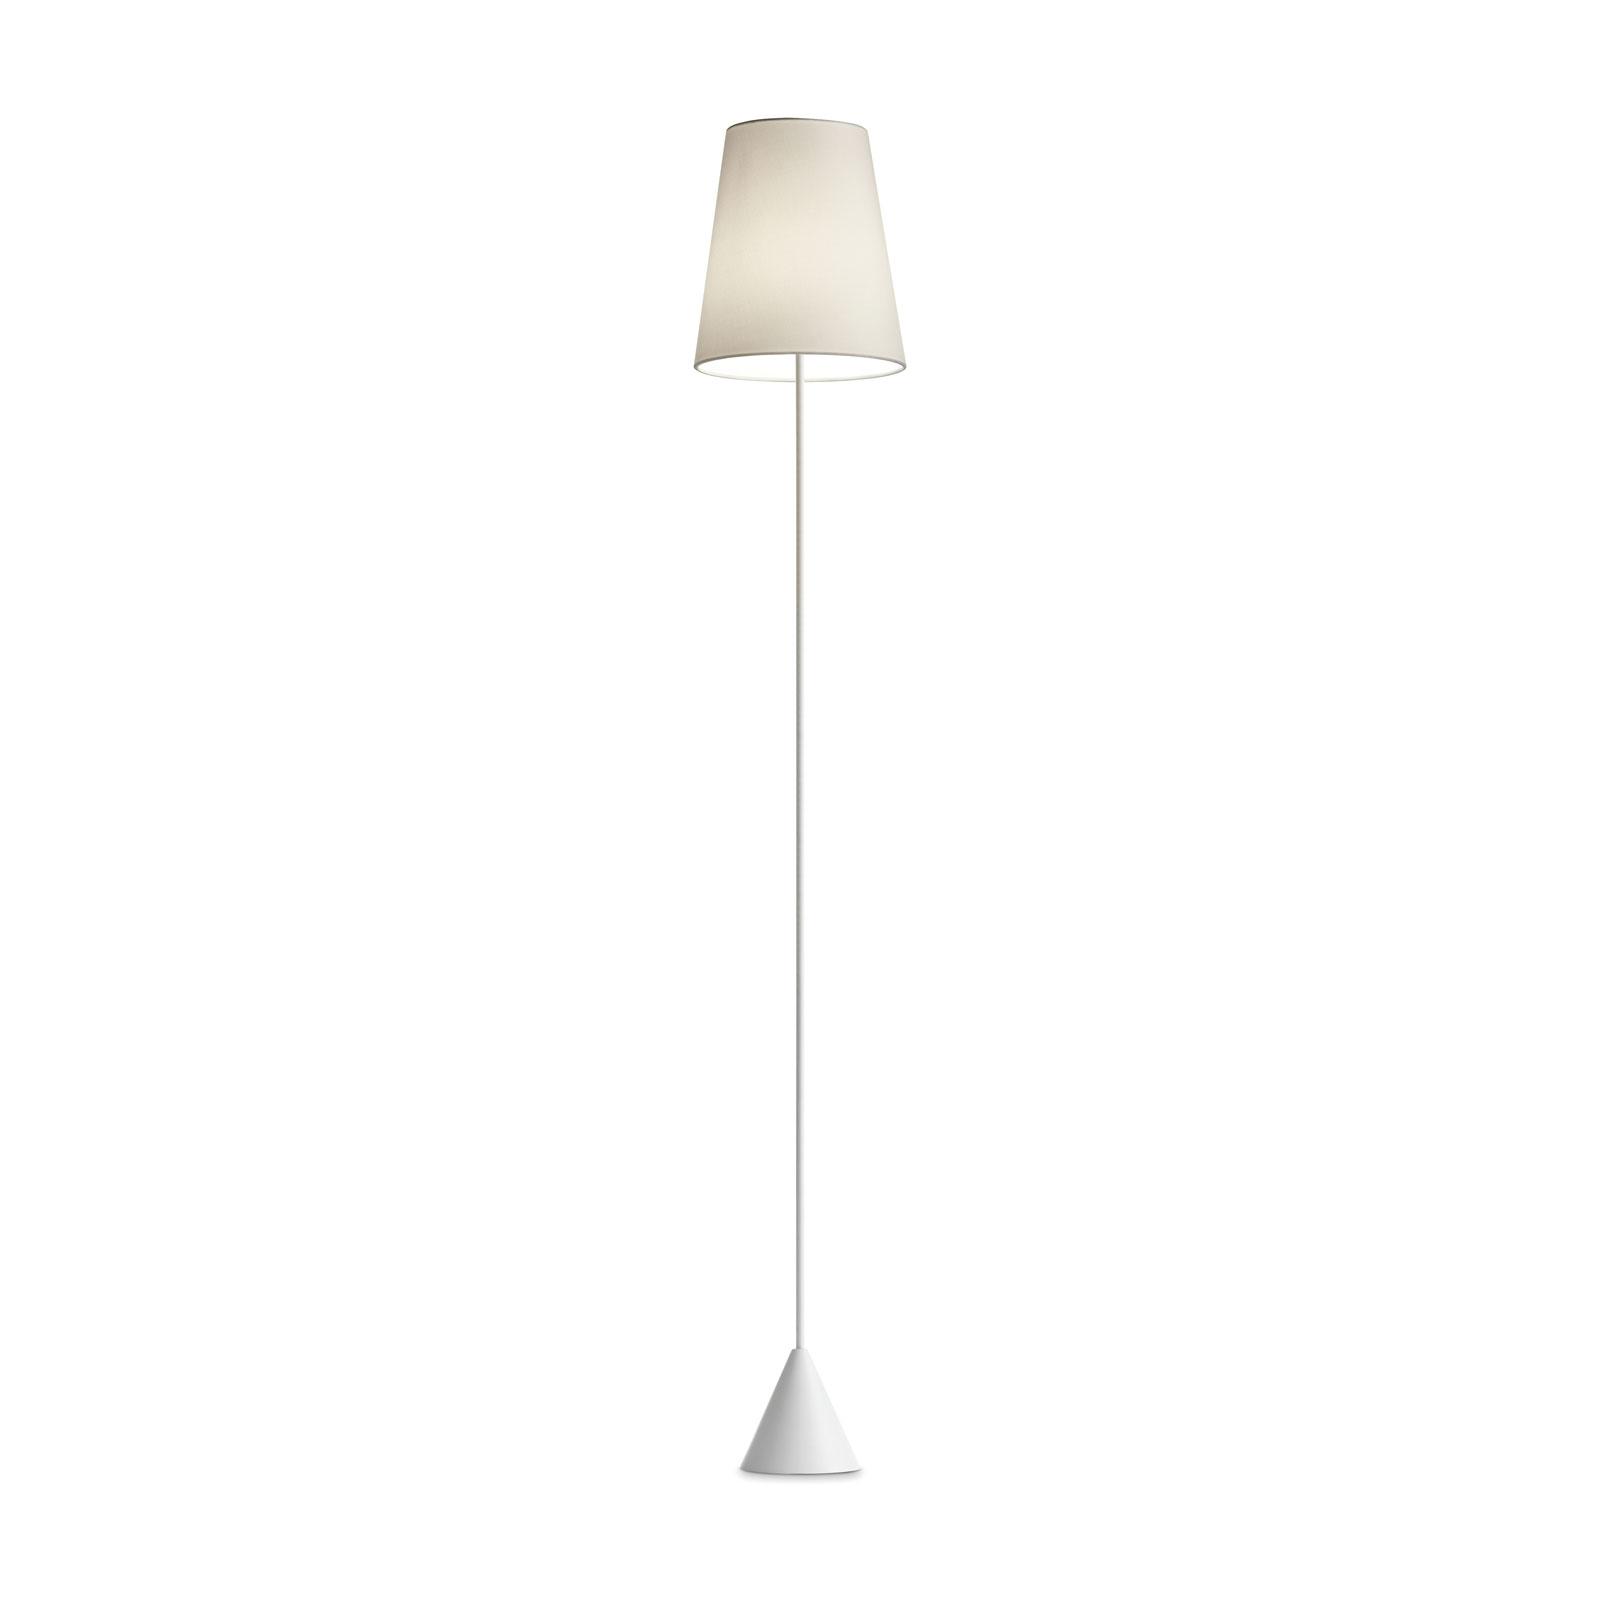 Modo Luce Lucilla vloerlamp Ø 24cm wit/ivoor